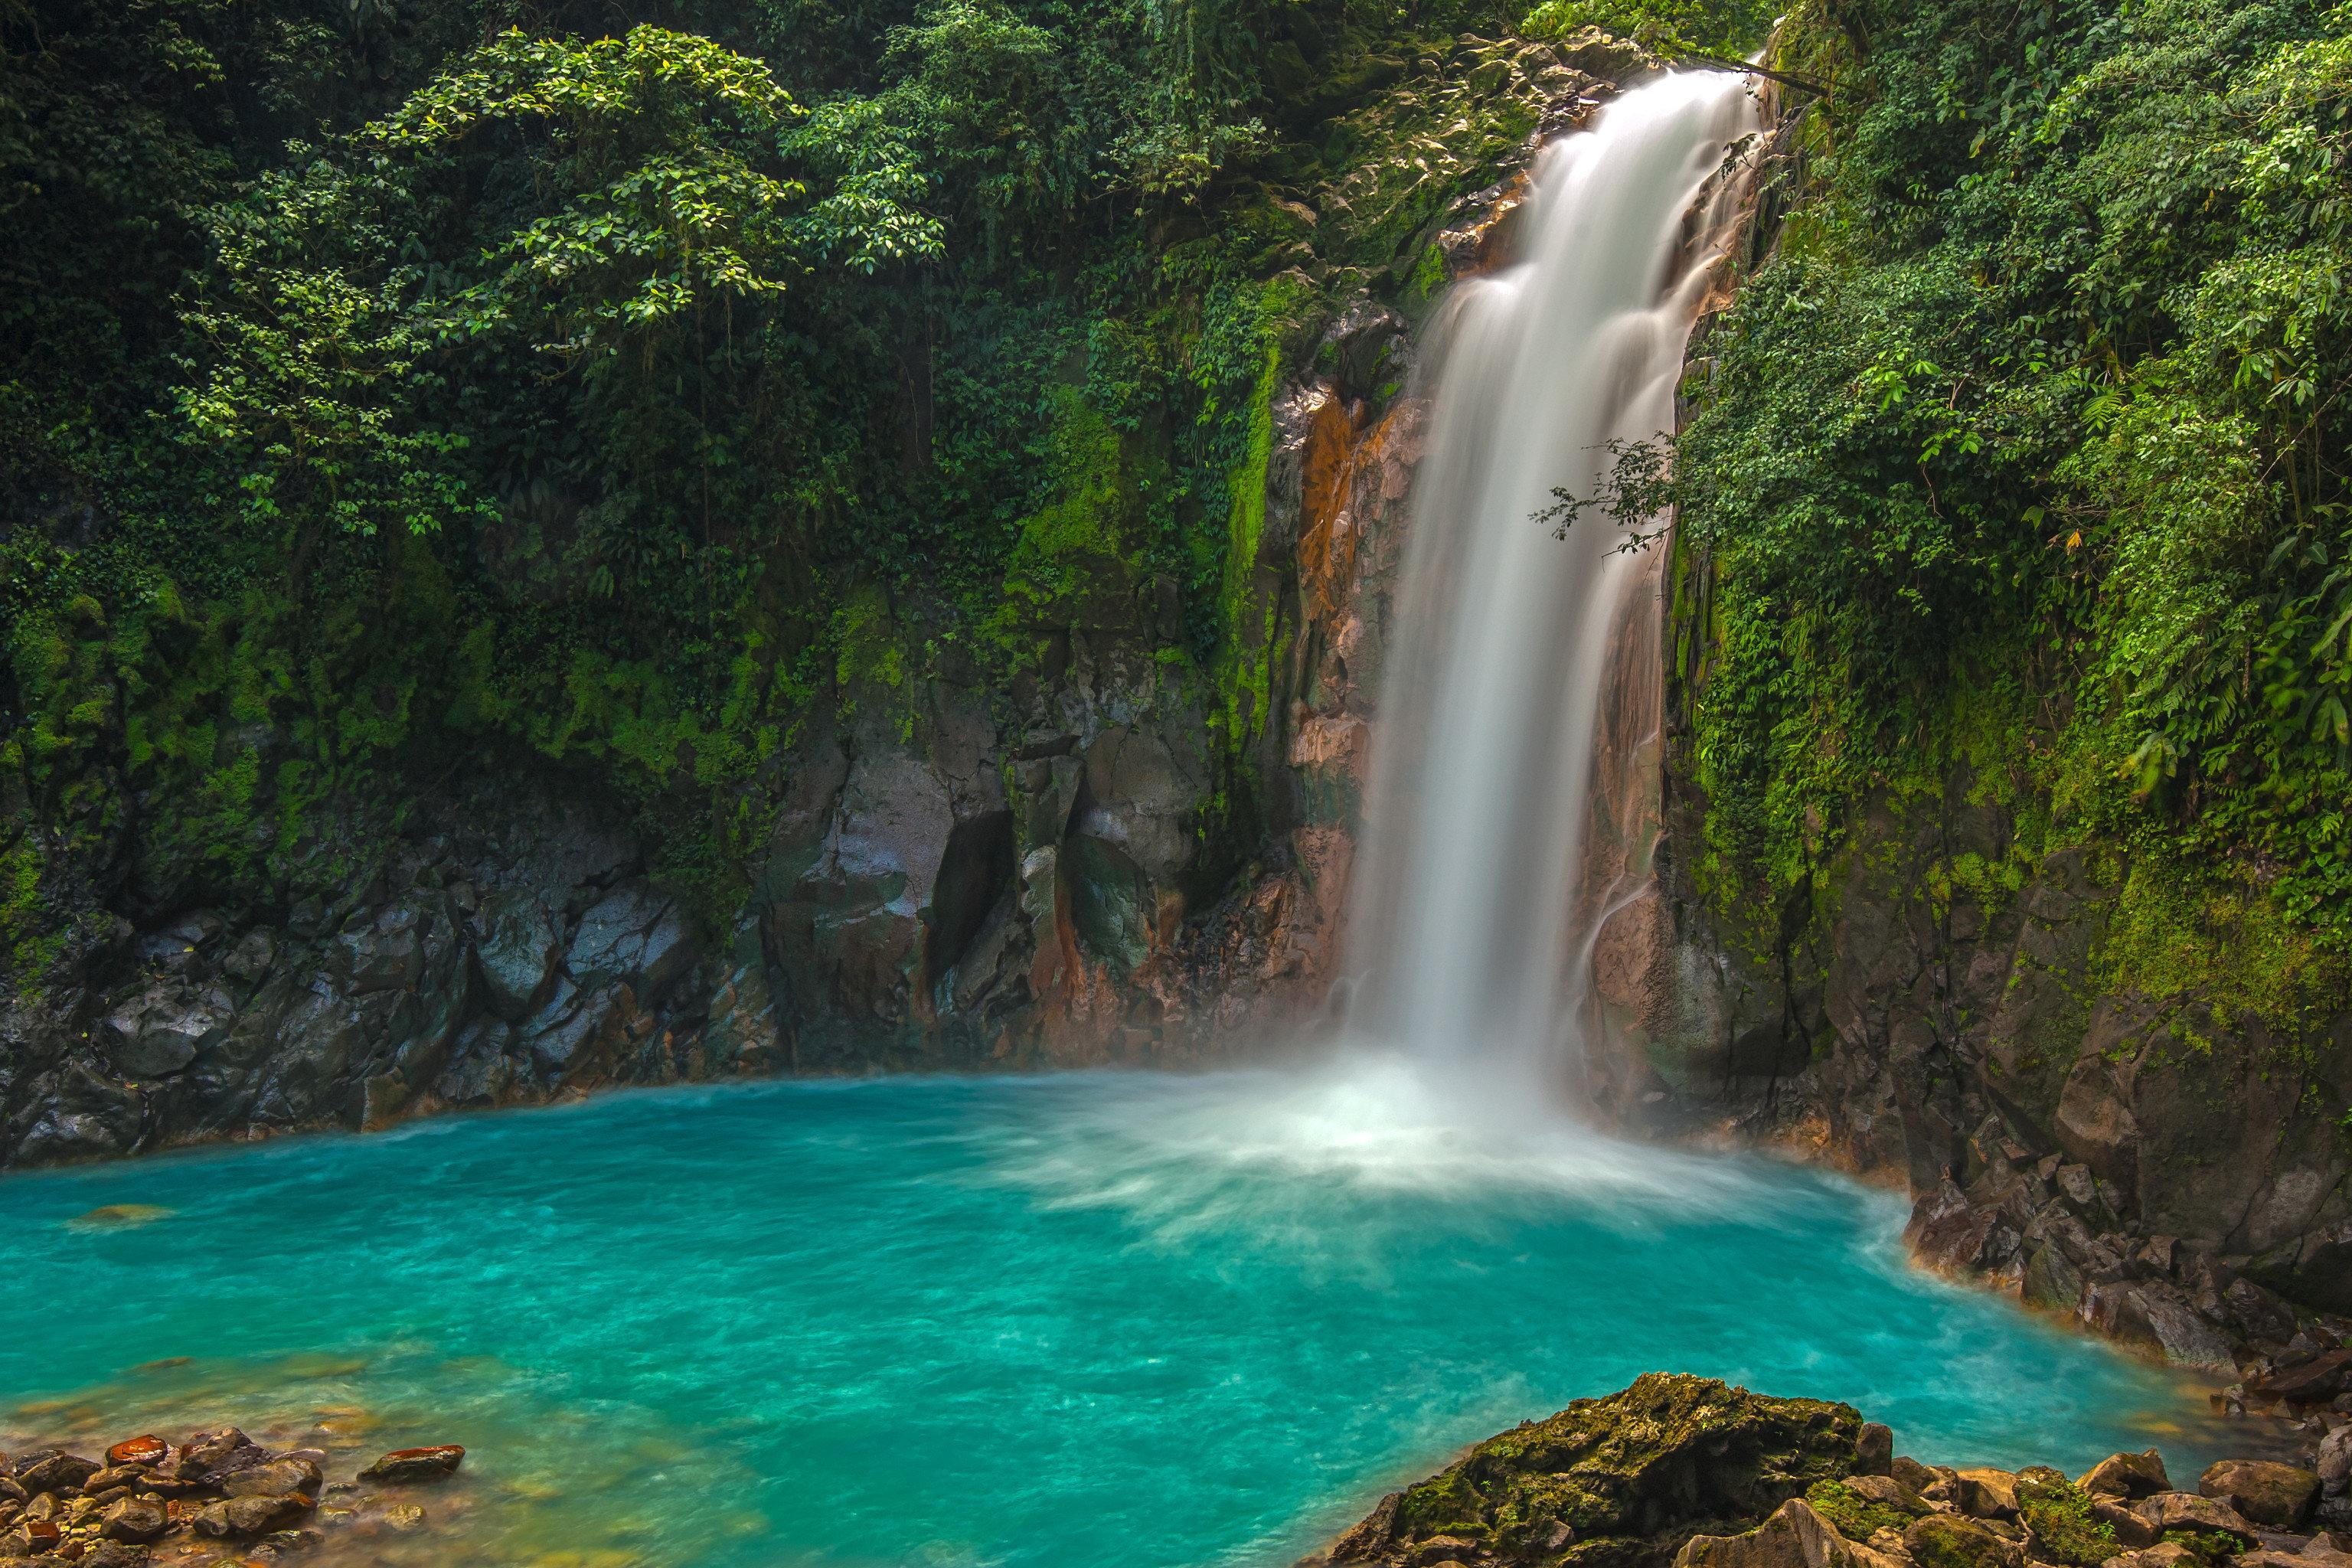 Offbeat Trip Ideas tree Nature water outdoor Waterfall body of water water feature watercourse wasserfall rainforest Jungle